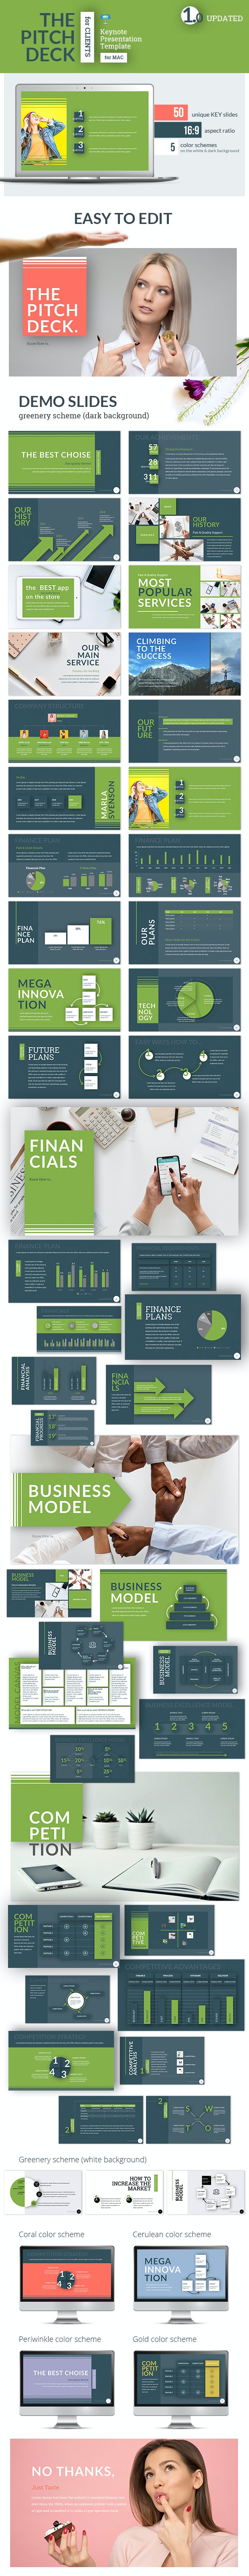 Pitch Deck for Clients Keynote Presentation Template - Keynote Templates Presentation Templates